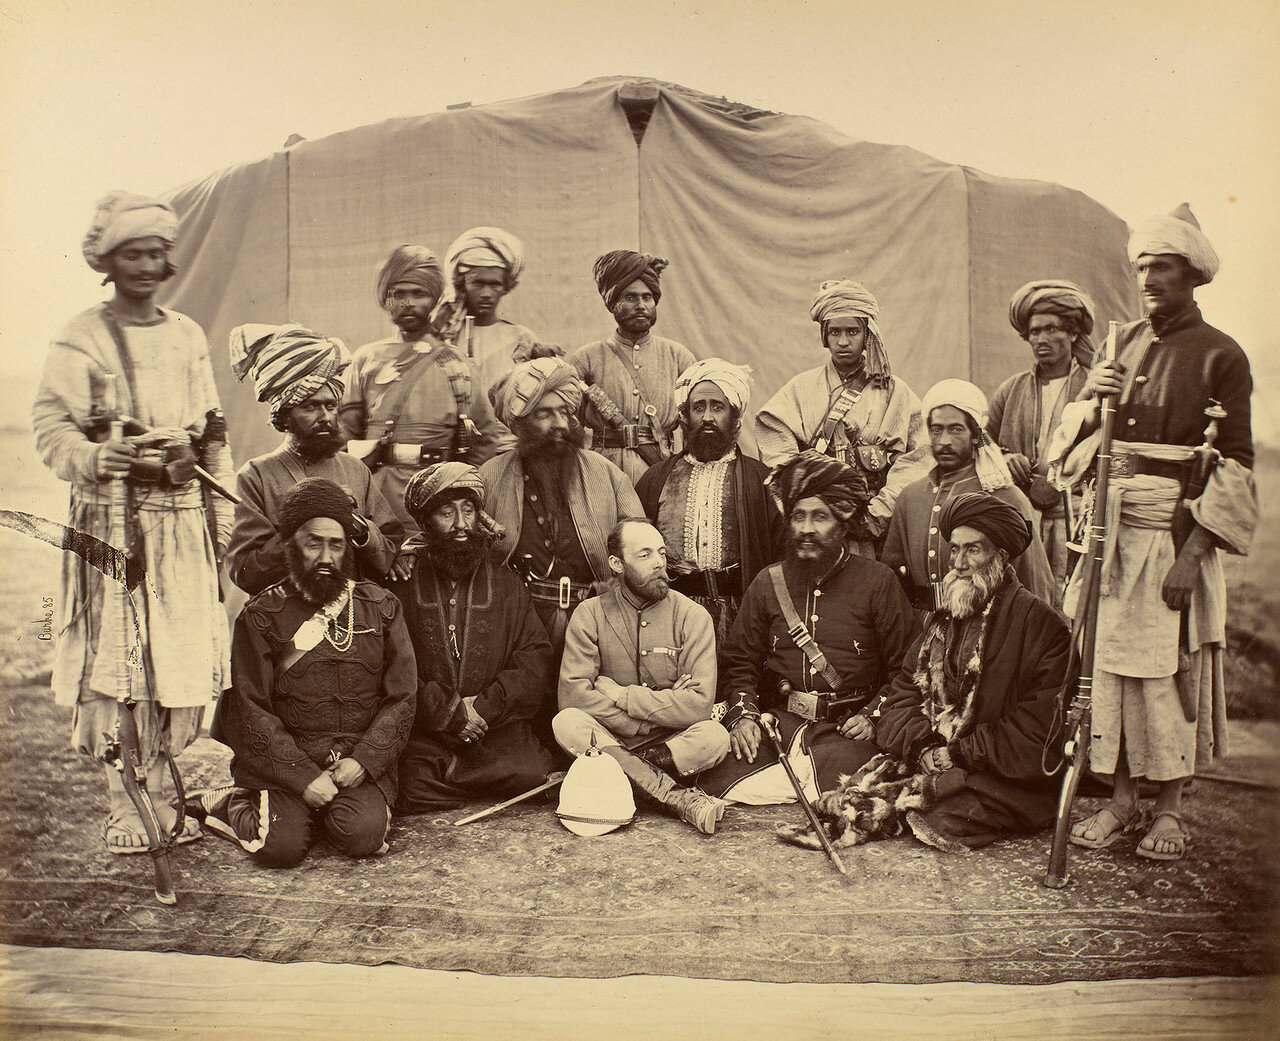 Сэр Пьер Луи Наполеон Каваньяри с афганскими племенными вождями